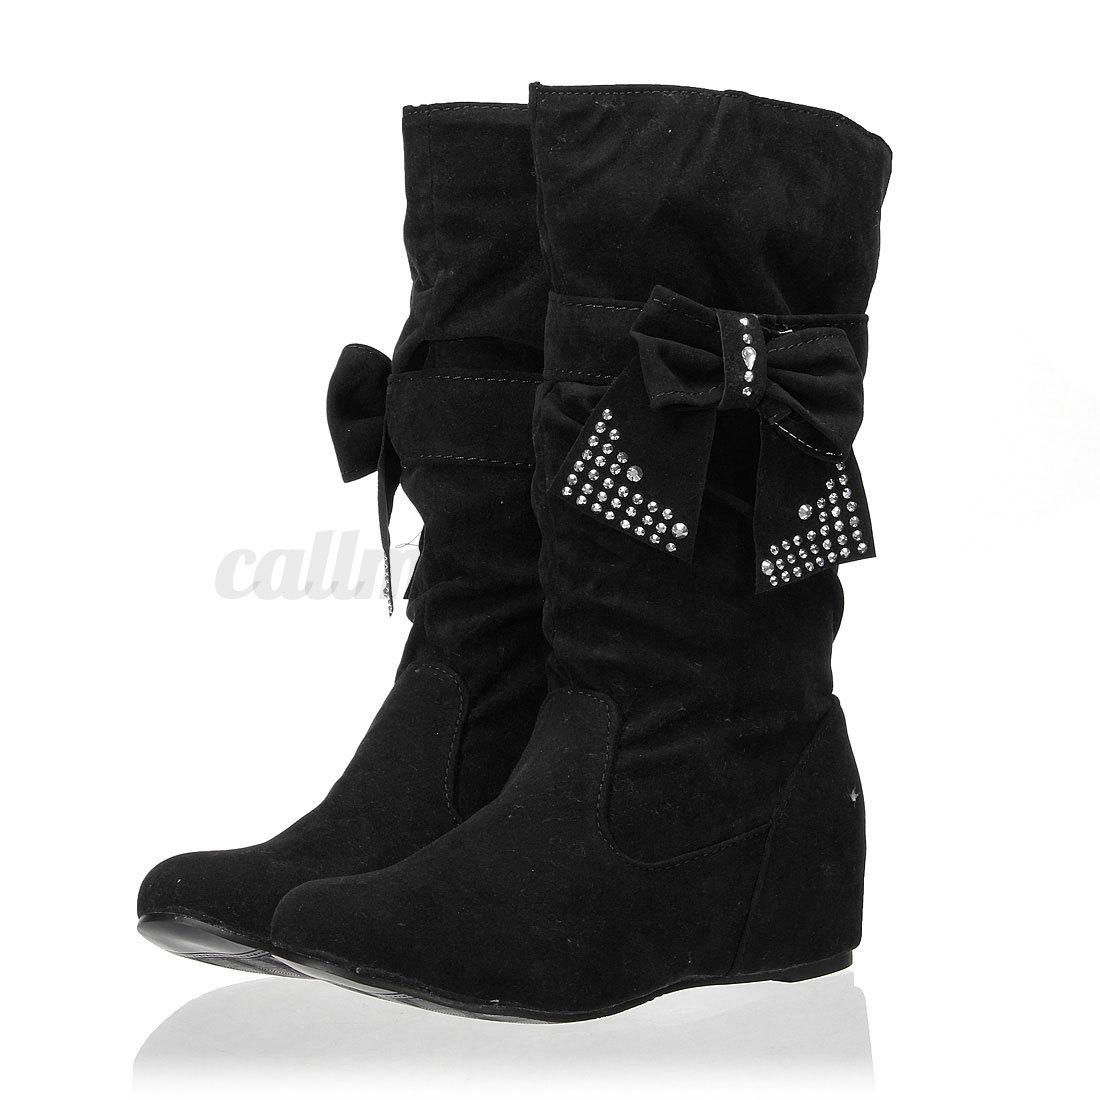 womens mid calf tassels suede boots winter slip on flat